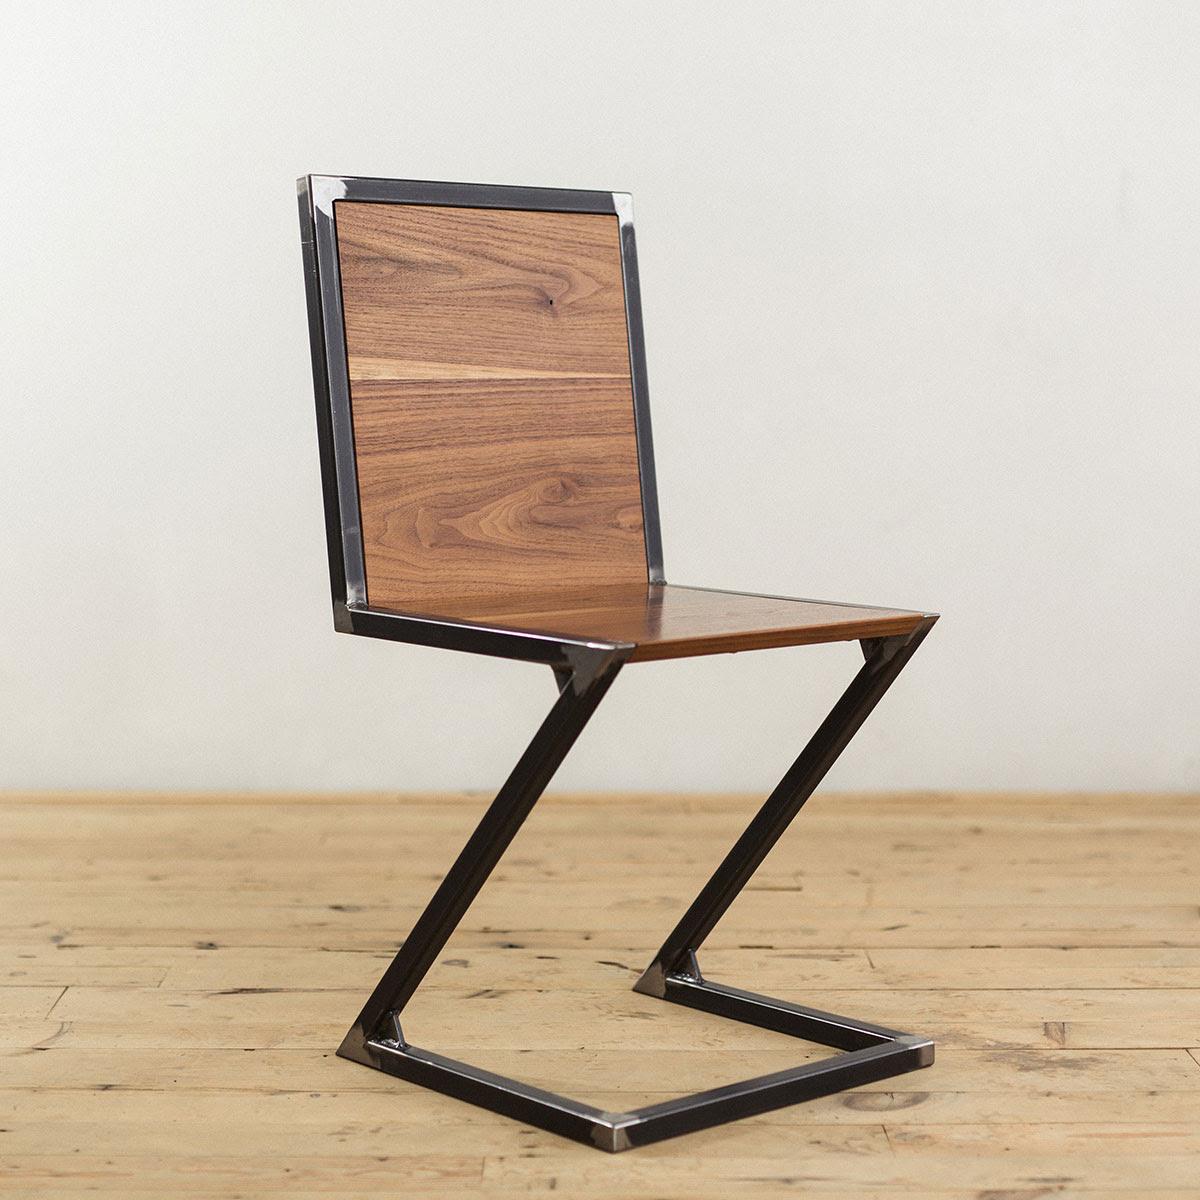 industrial-modern-raw-steel-walnut-wood-z-chair - Canoe There